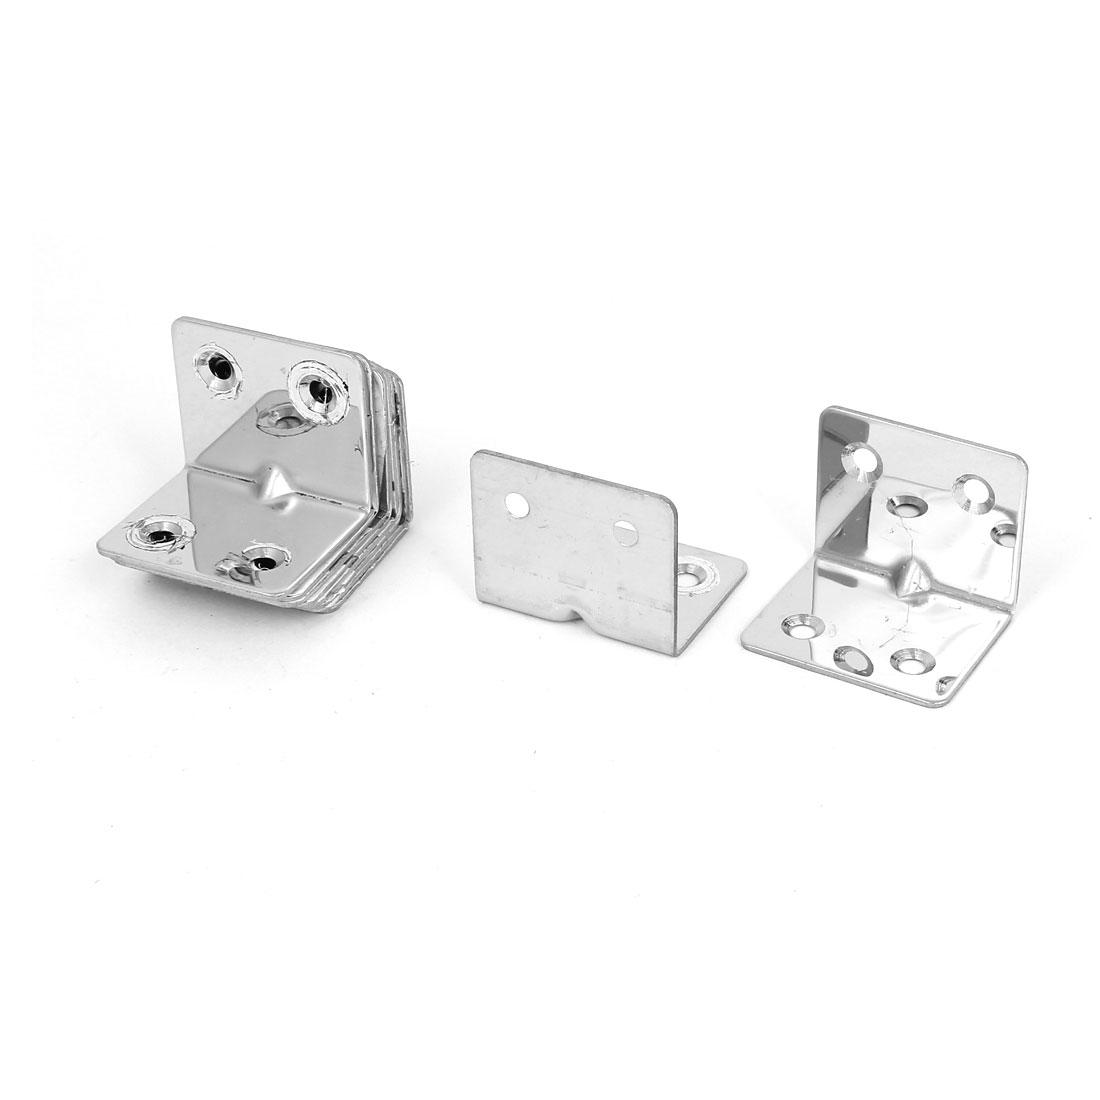 10pcs Furniture Shelf L Shaped Angle Brackets Corner Braces Supports 38x29mm